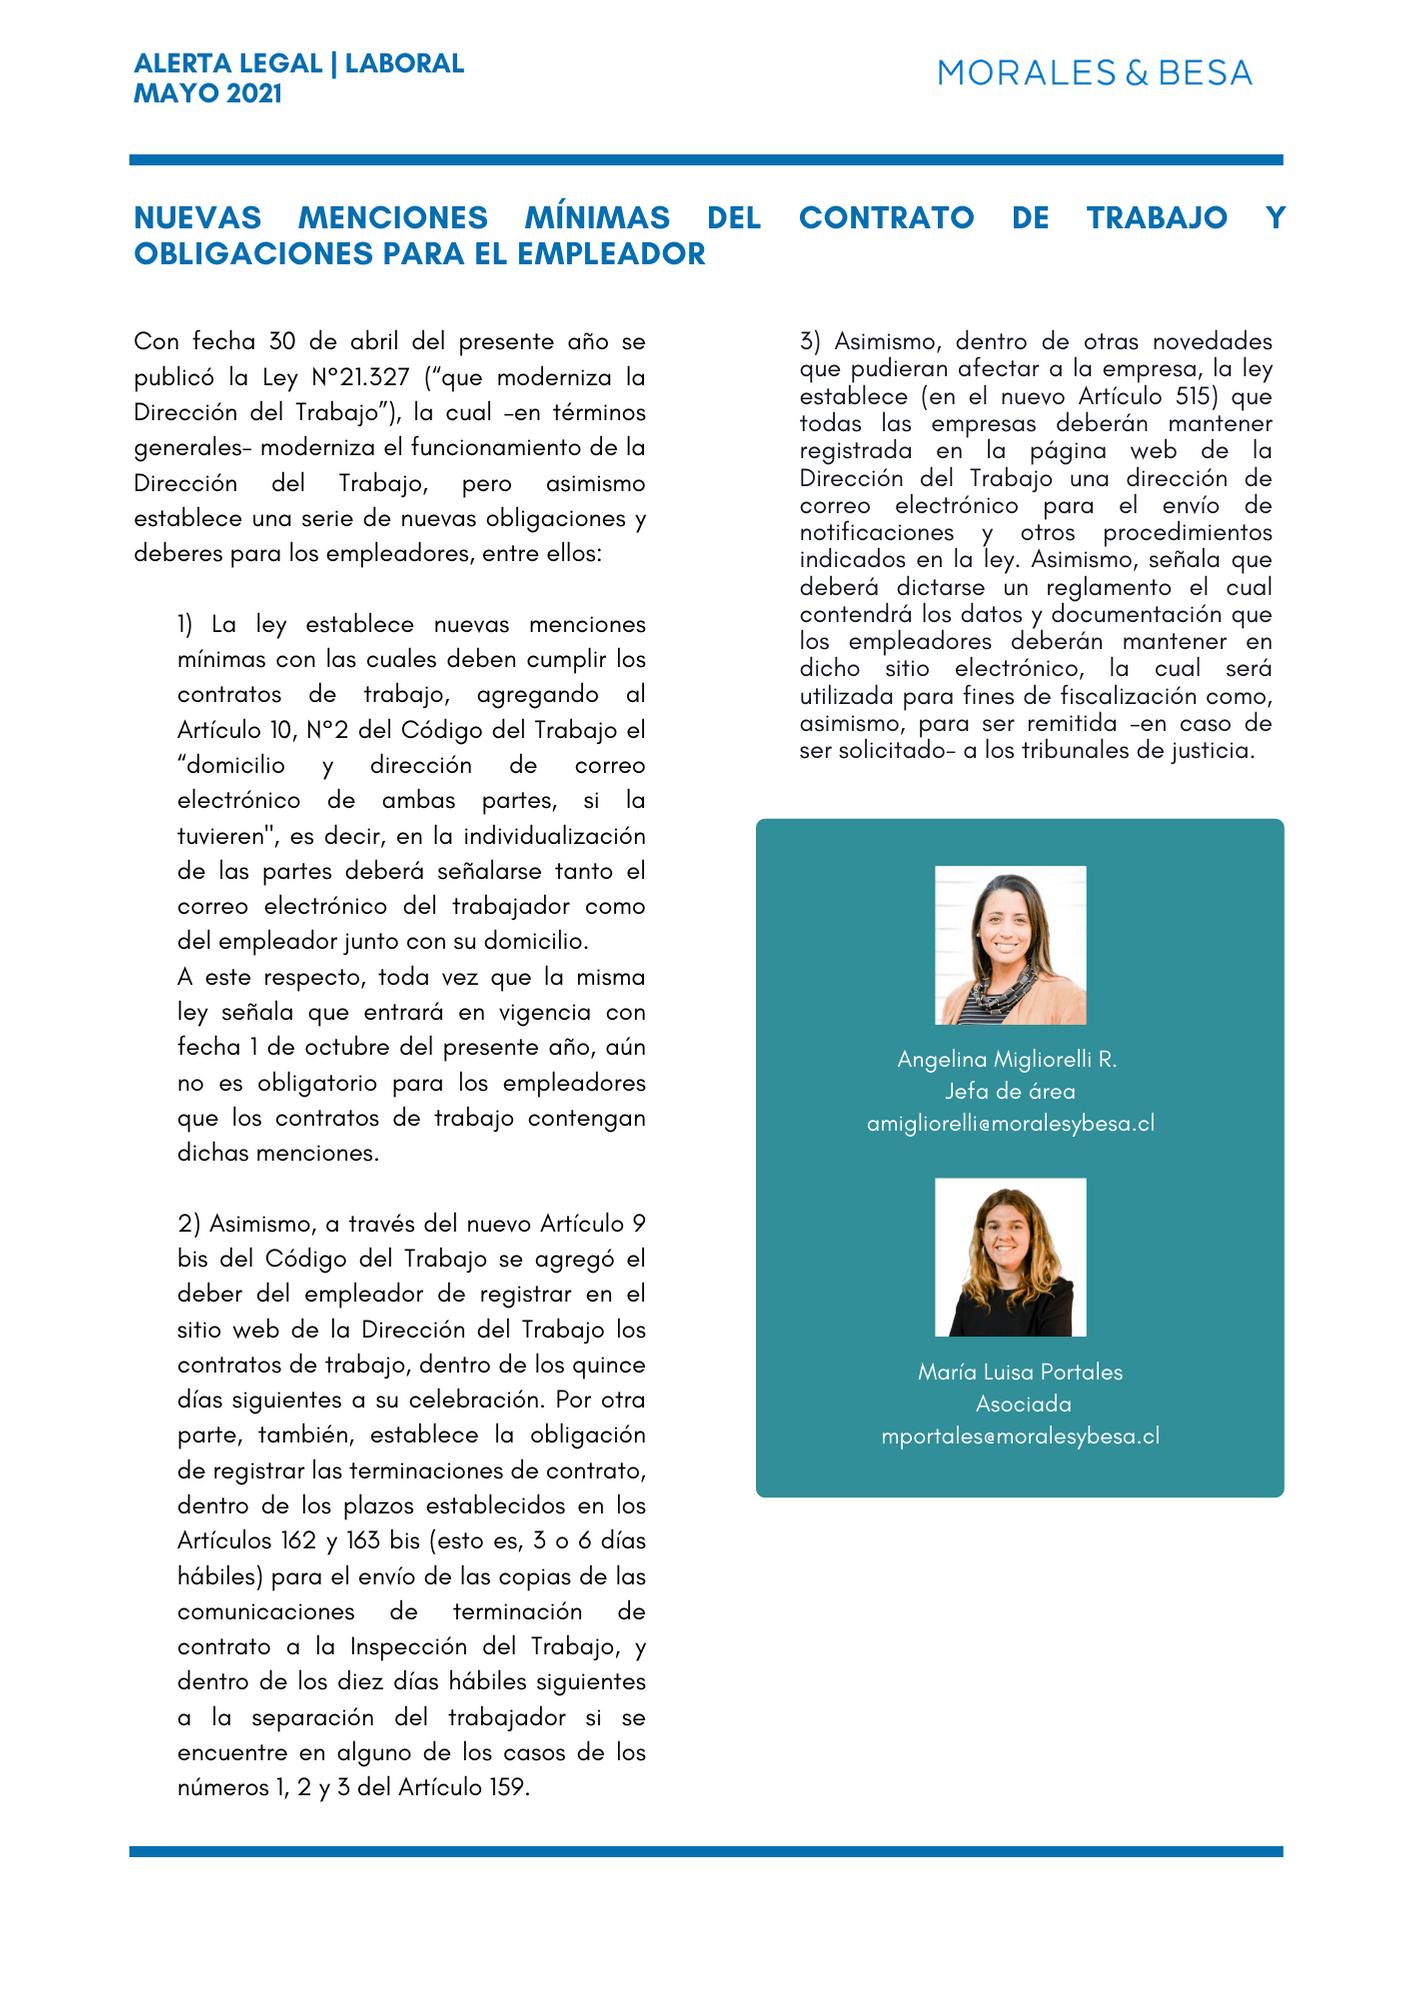 Alerta Legal M&B - Laboral - Mayo 2021